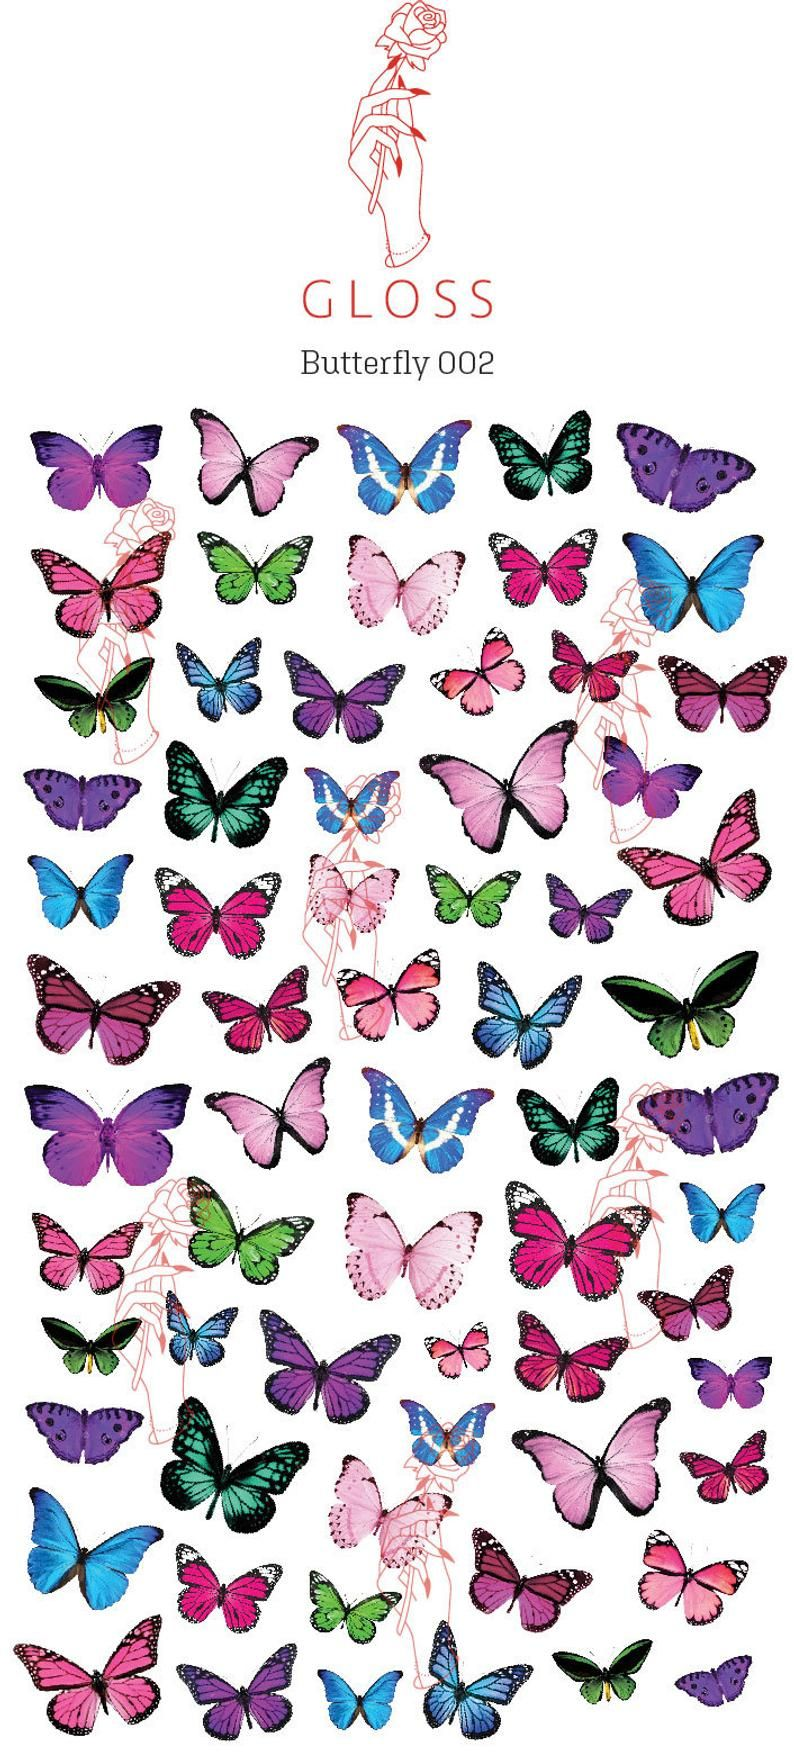 Butterfly 002 butterfly nails butterflies butterfly